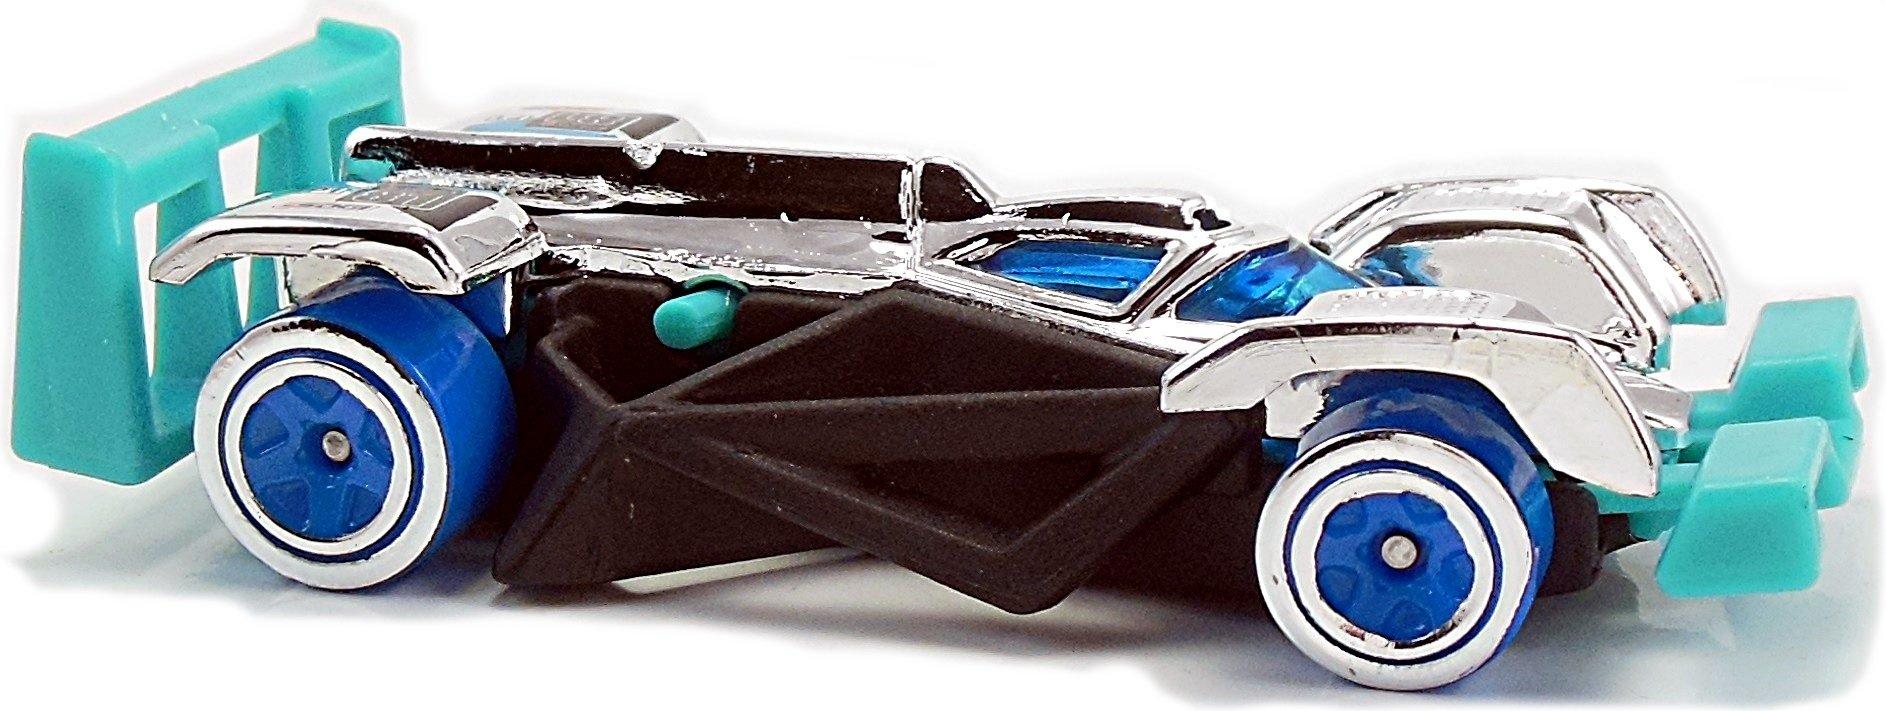 Carrinho Hot Wheels: Flash Drive Preto e Azul - Mattel